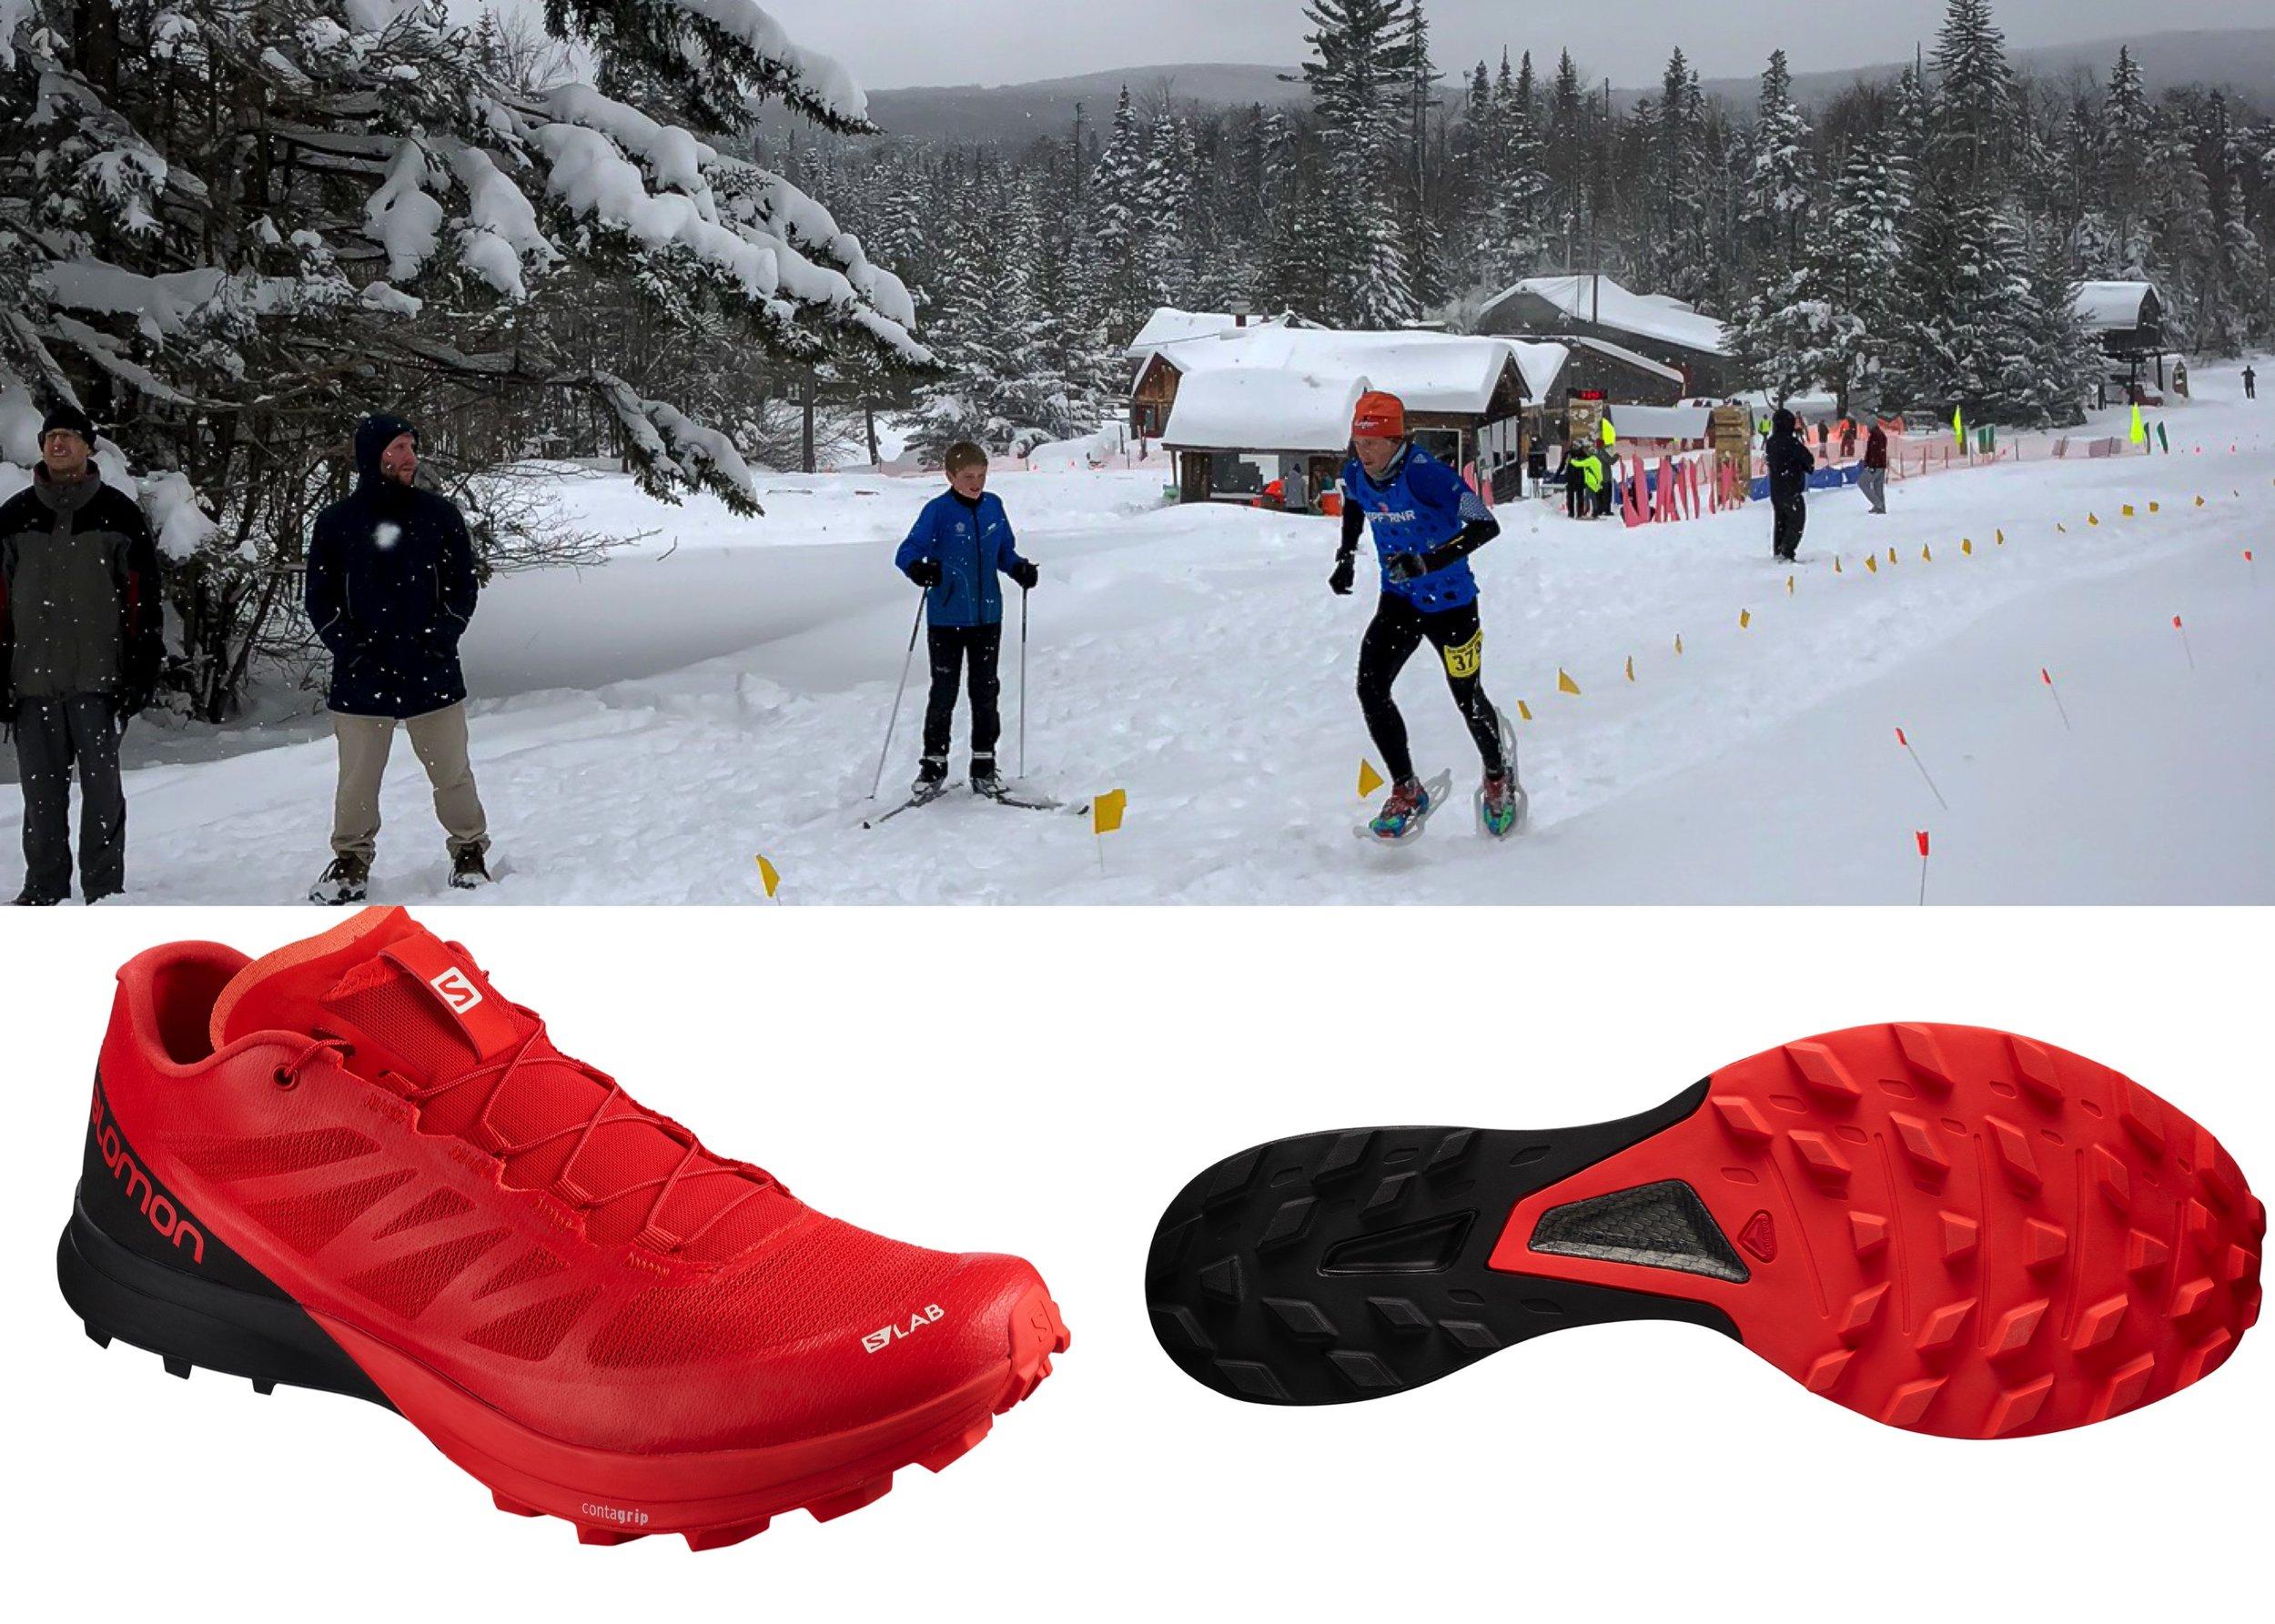 f9319d88f423 Salomon S LAB Sense 7 SG Trail Running Shoe — Mountain Peak Fitness